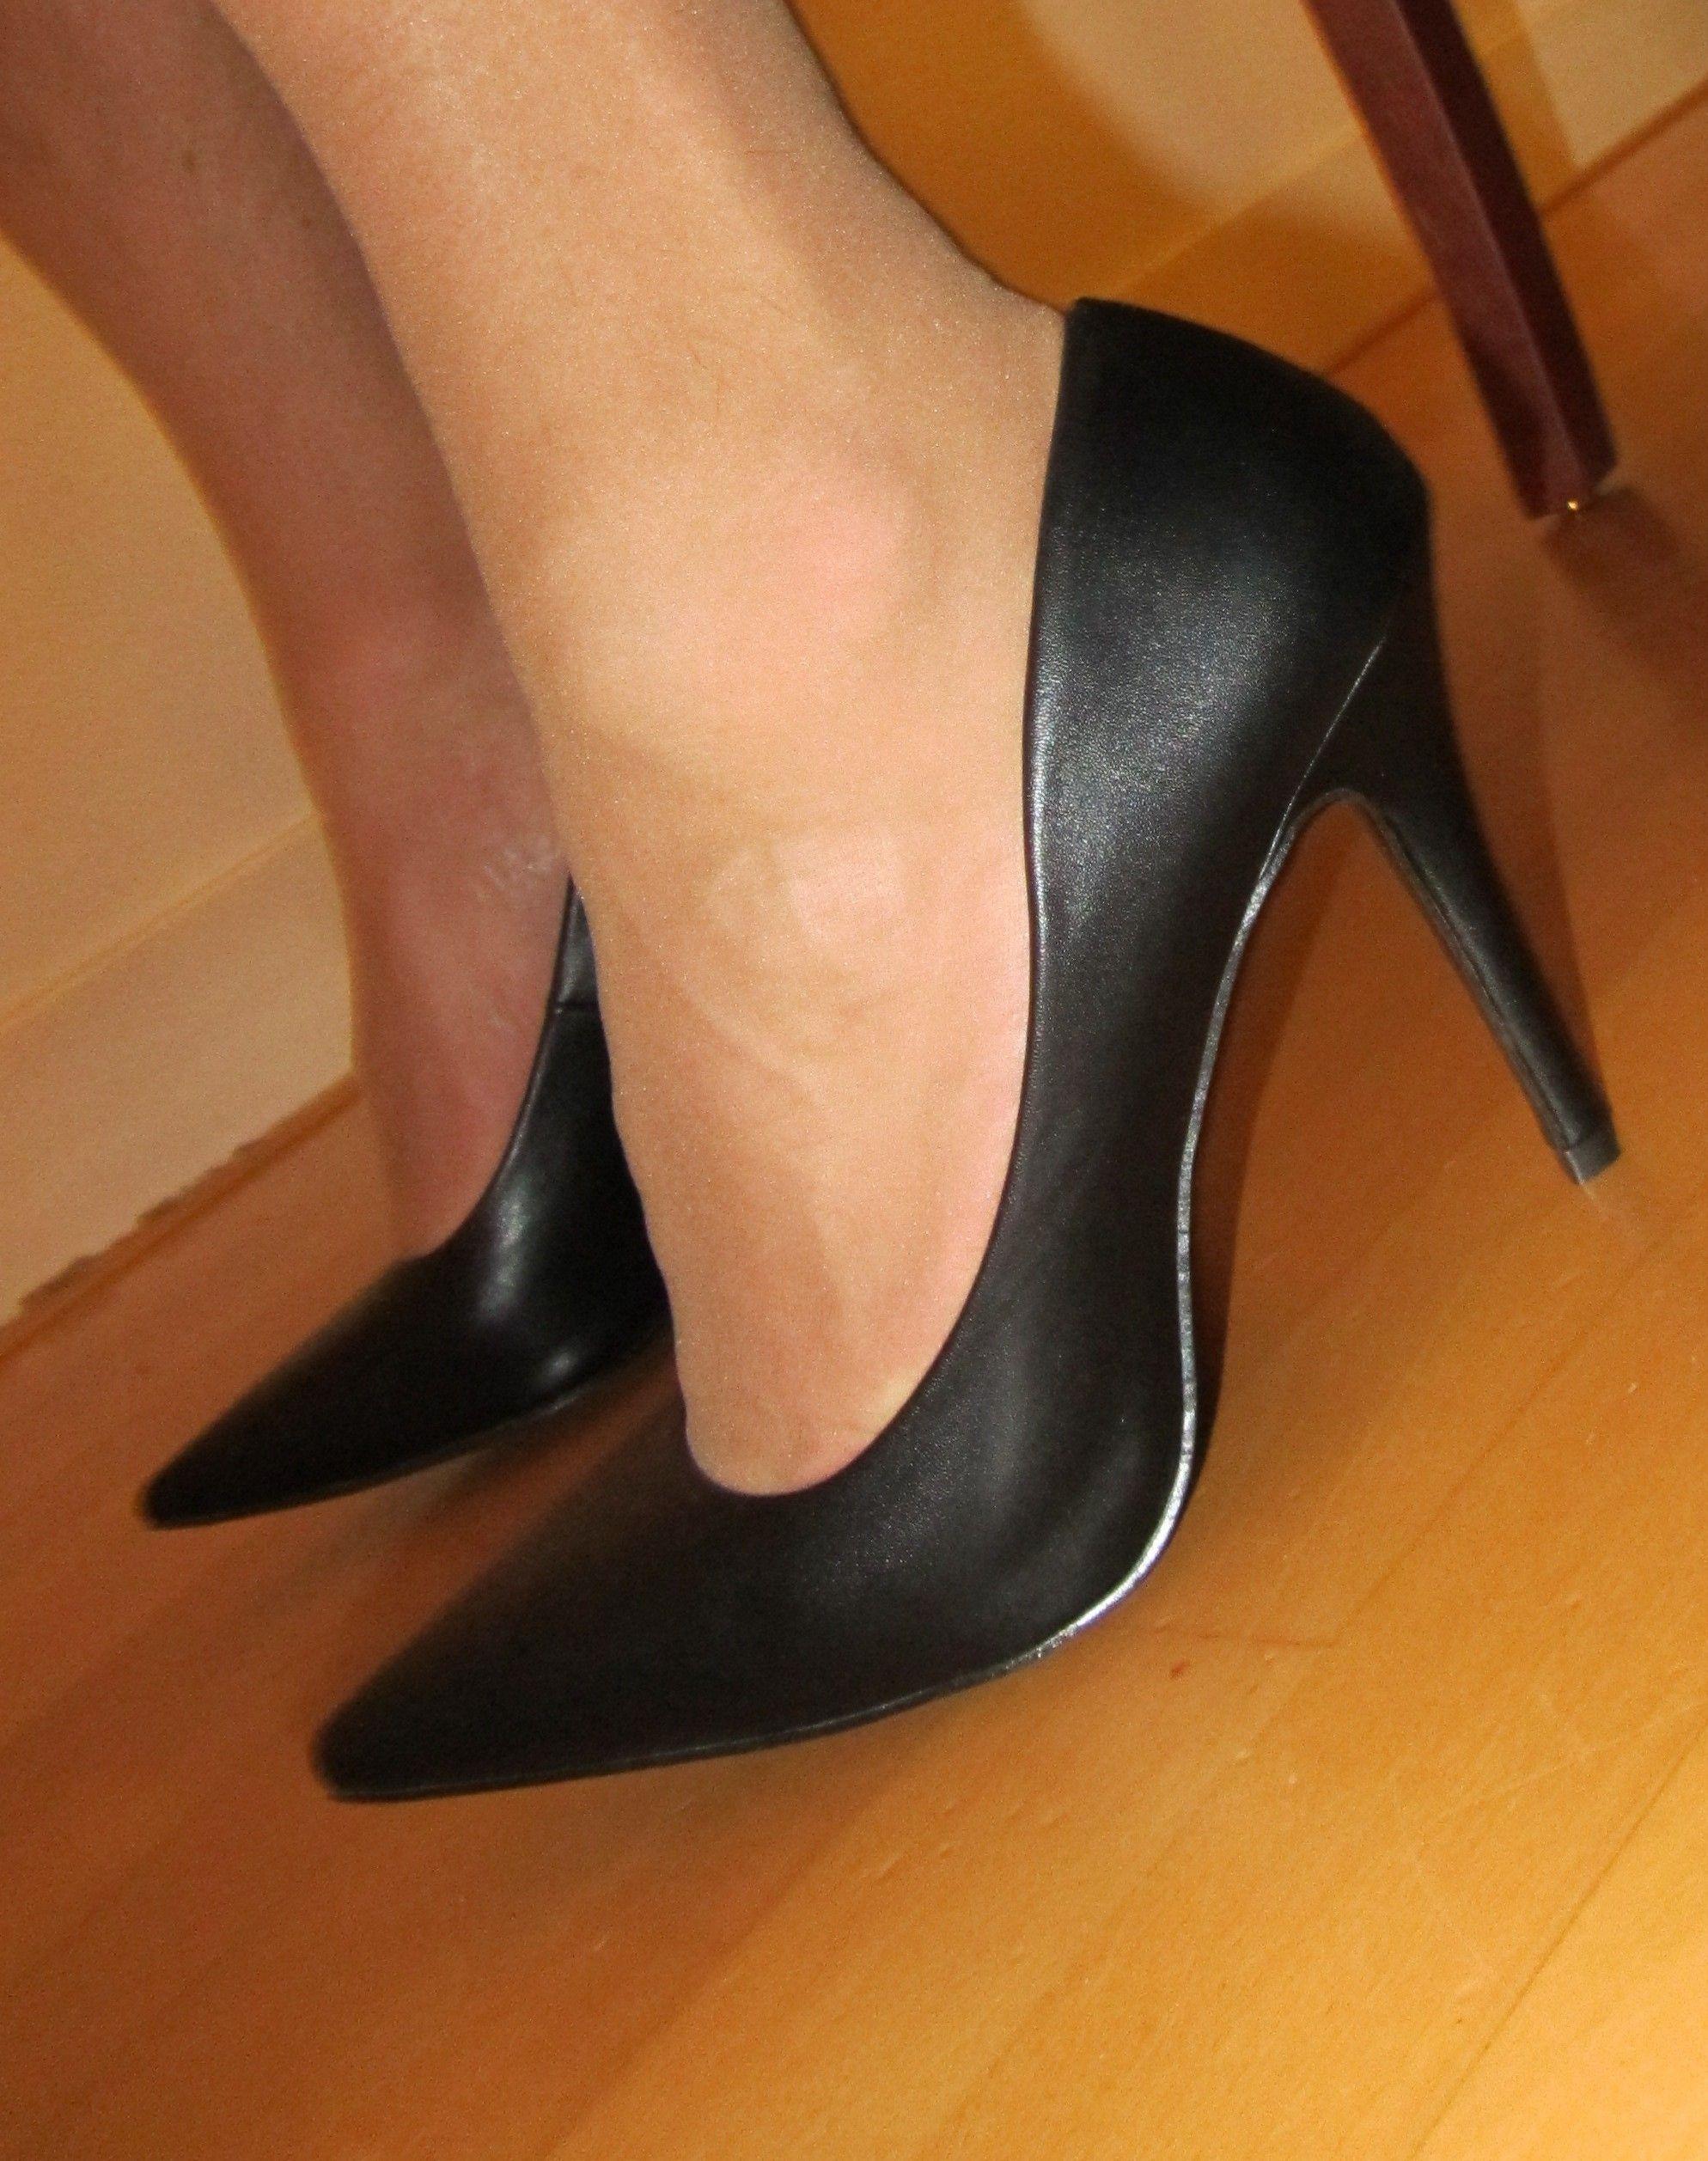 0f426566b16 My black high heel pumps. #black #pumps #high #heels #heel ...